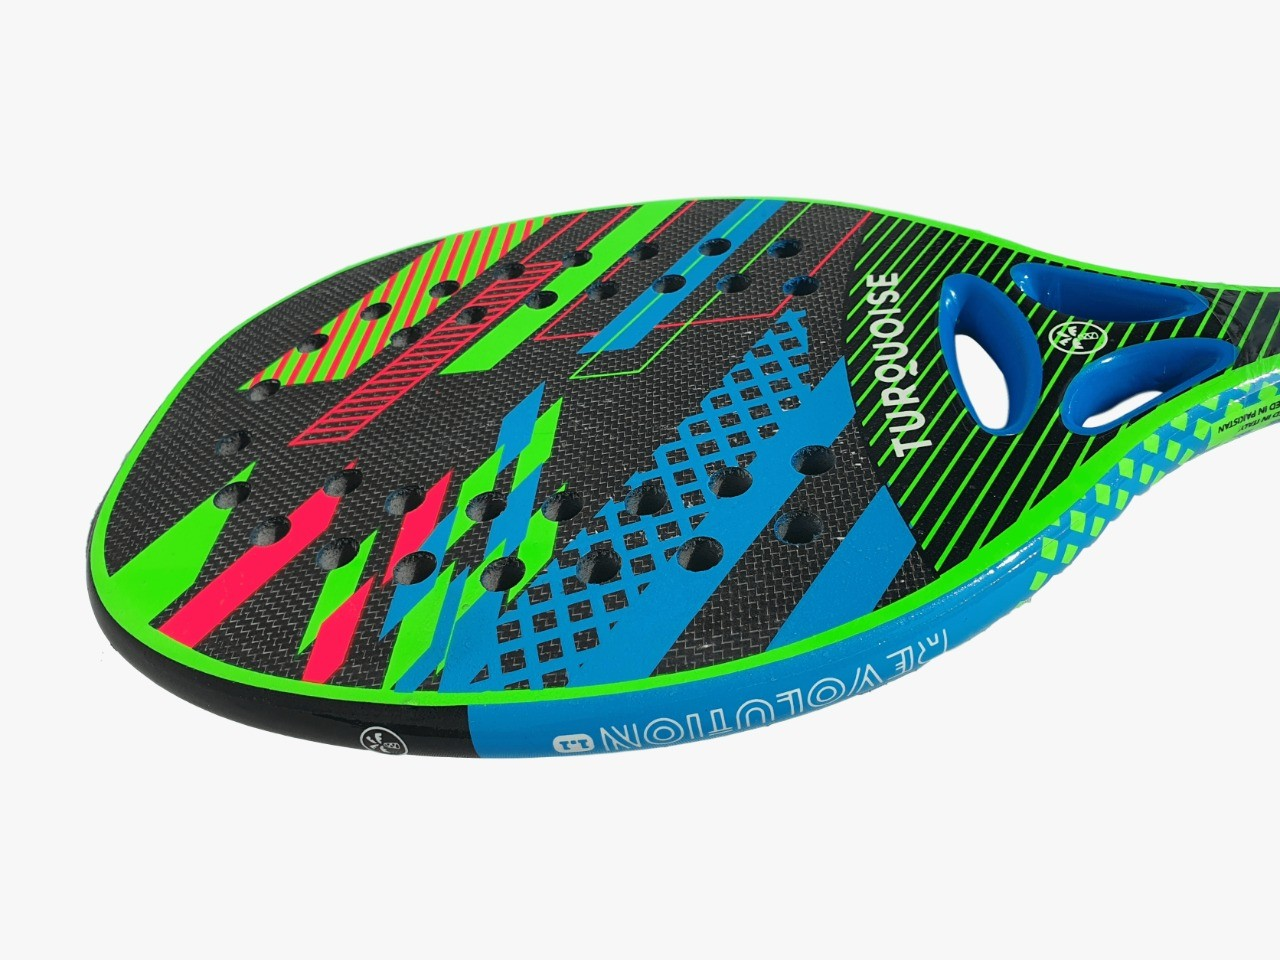 Raquete de Beach Tennis Turquoise Revolution 1.1 2020 Azul